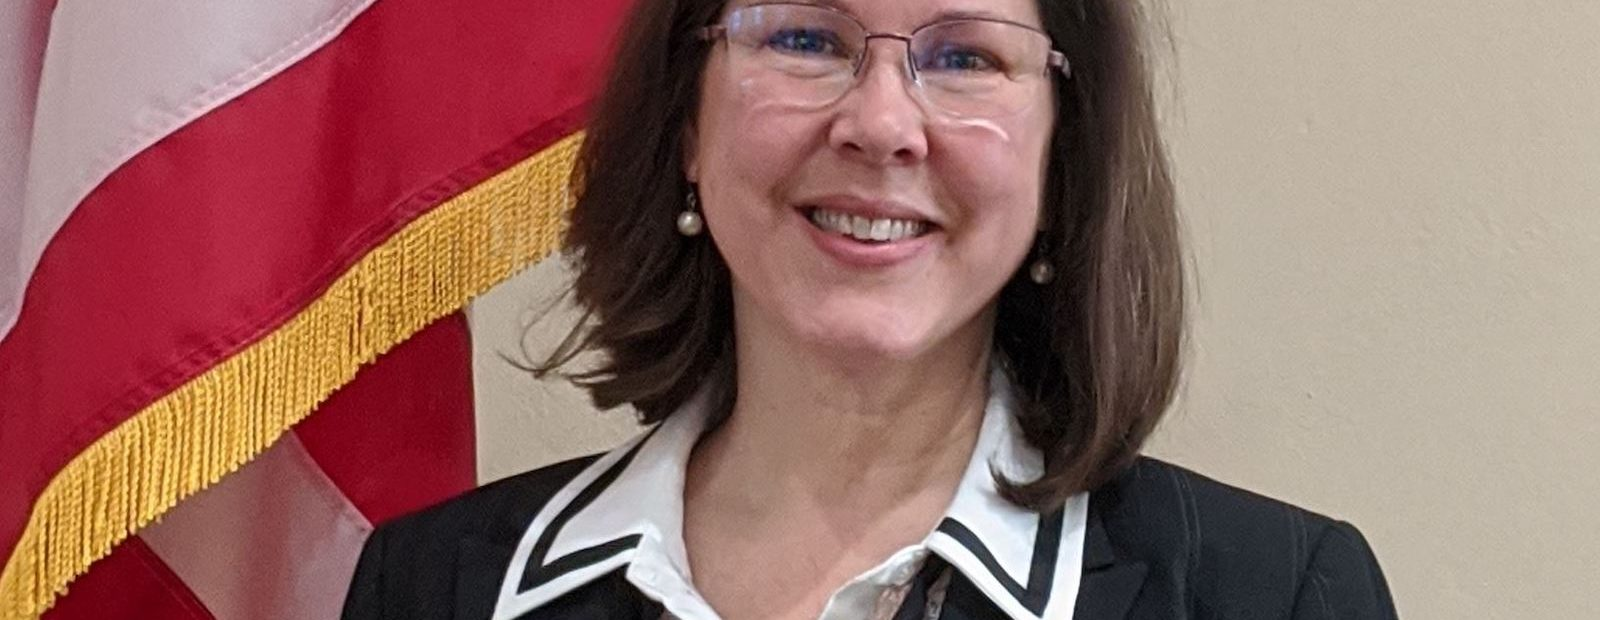 Wayne County Commissioner Jocelyn Cramer